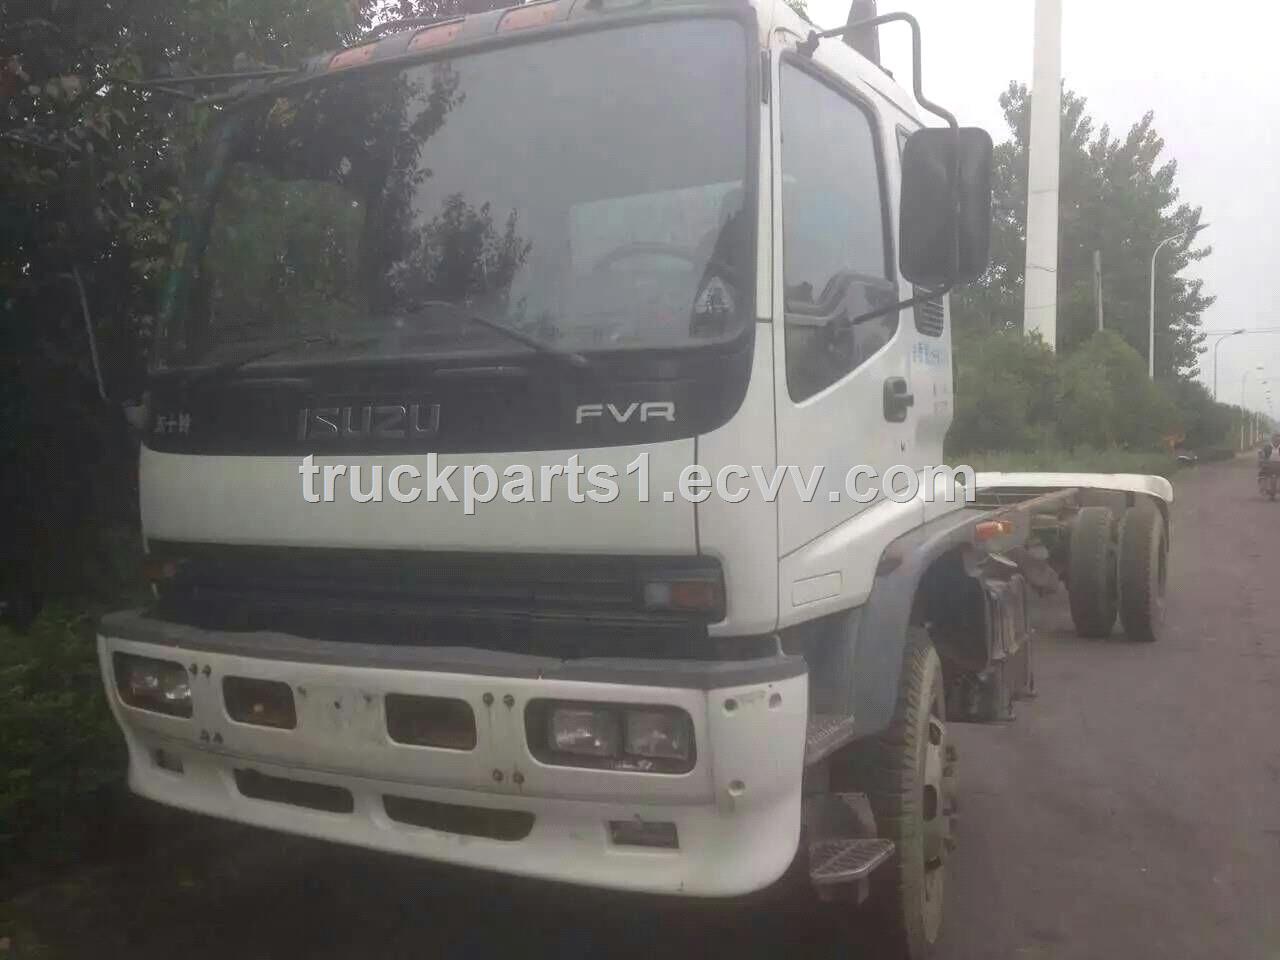 Used ISUZU Truck for Sale Mixer Truck Pump Truck Dump Truck